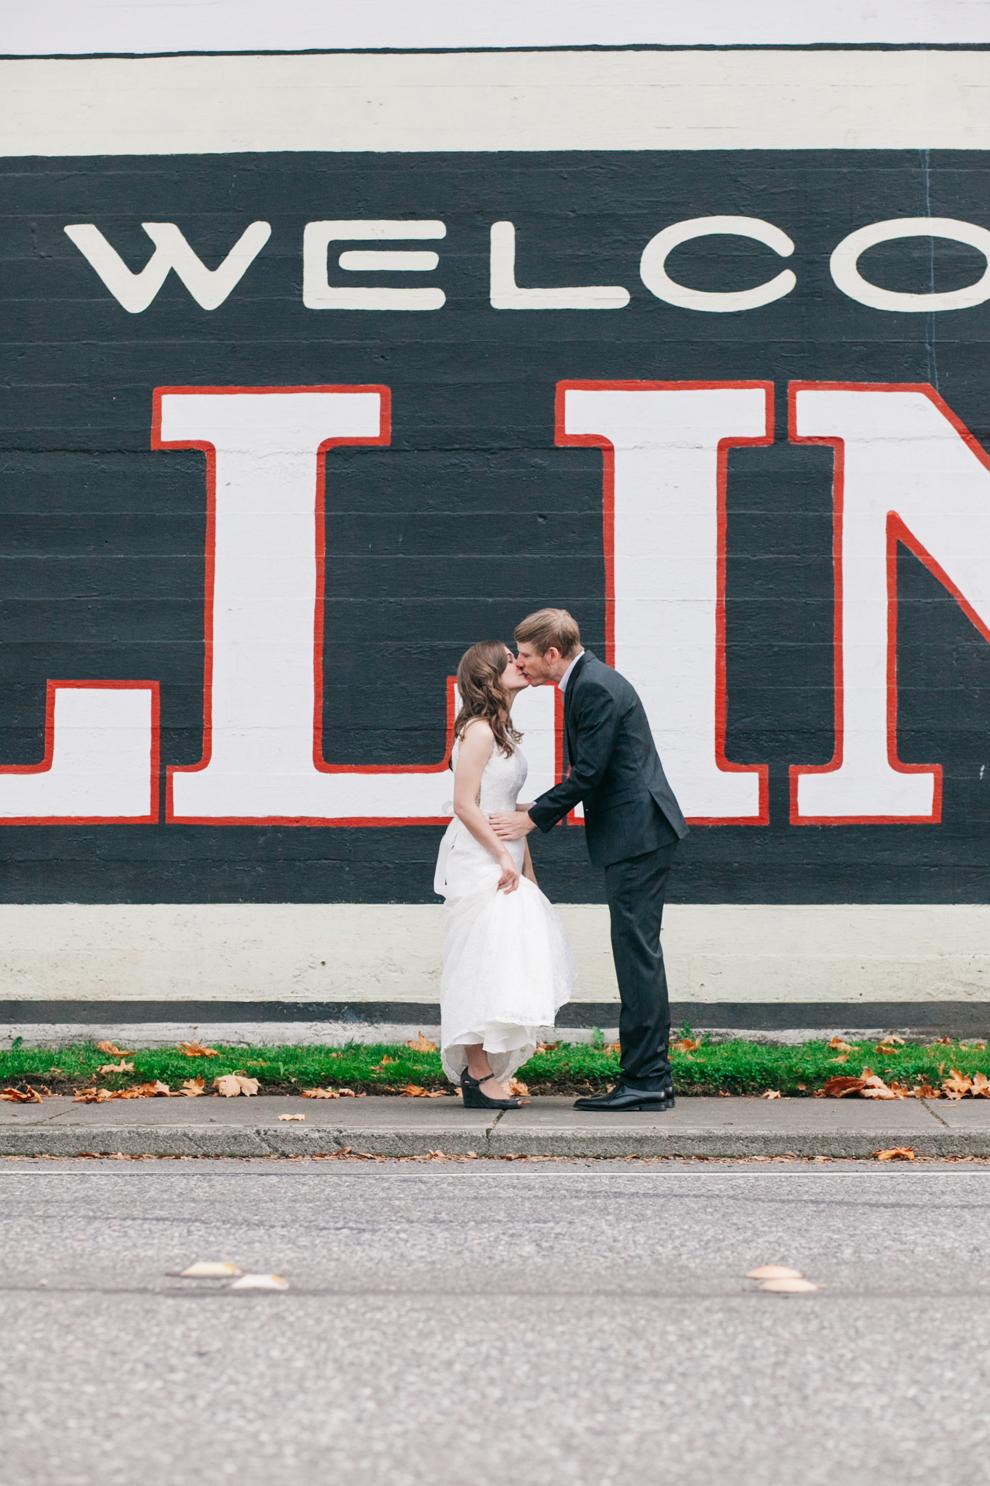 036-bellingham-washington-wedding-first-look-downtown-katheryn-moran-photography.jpg